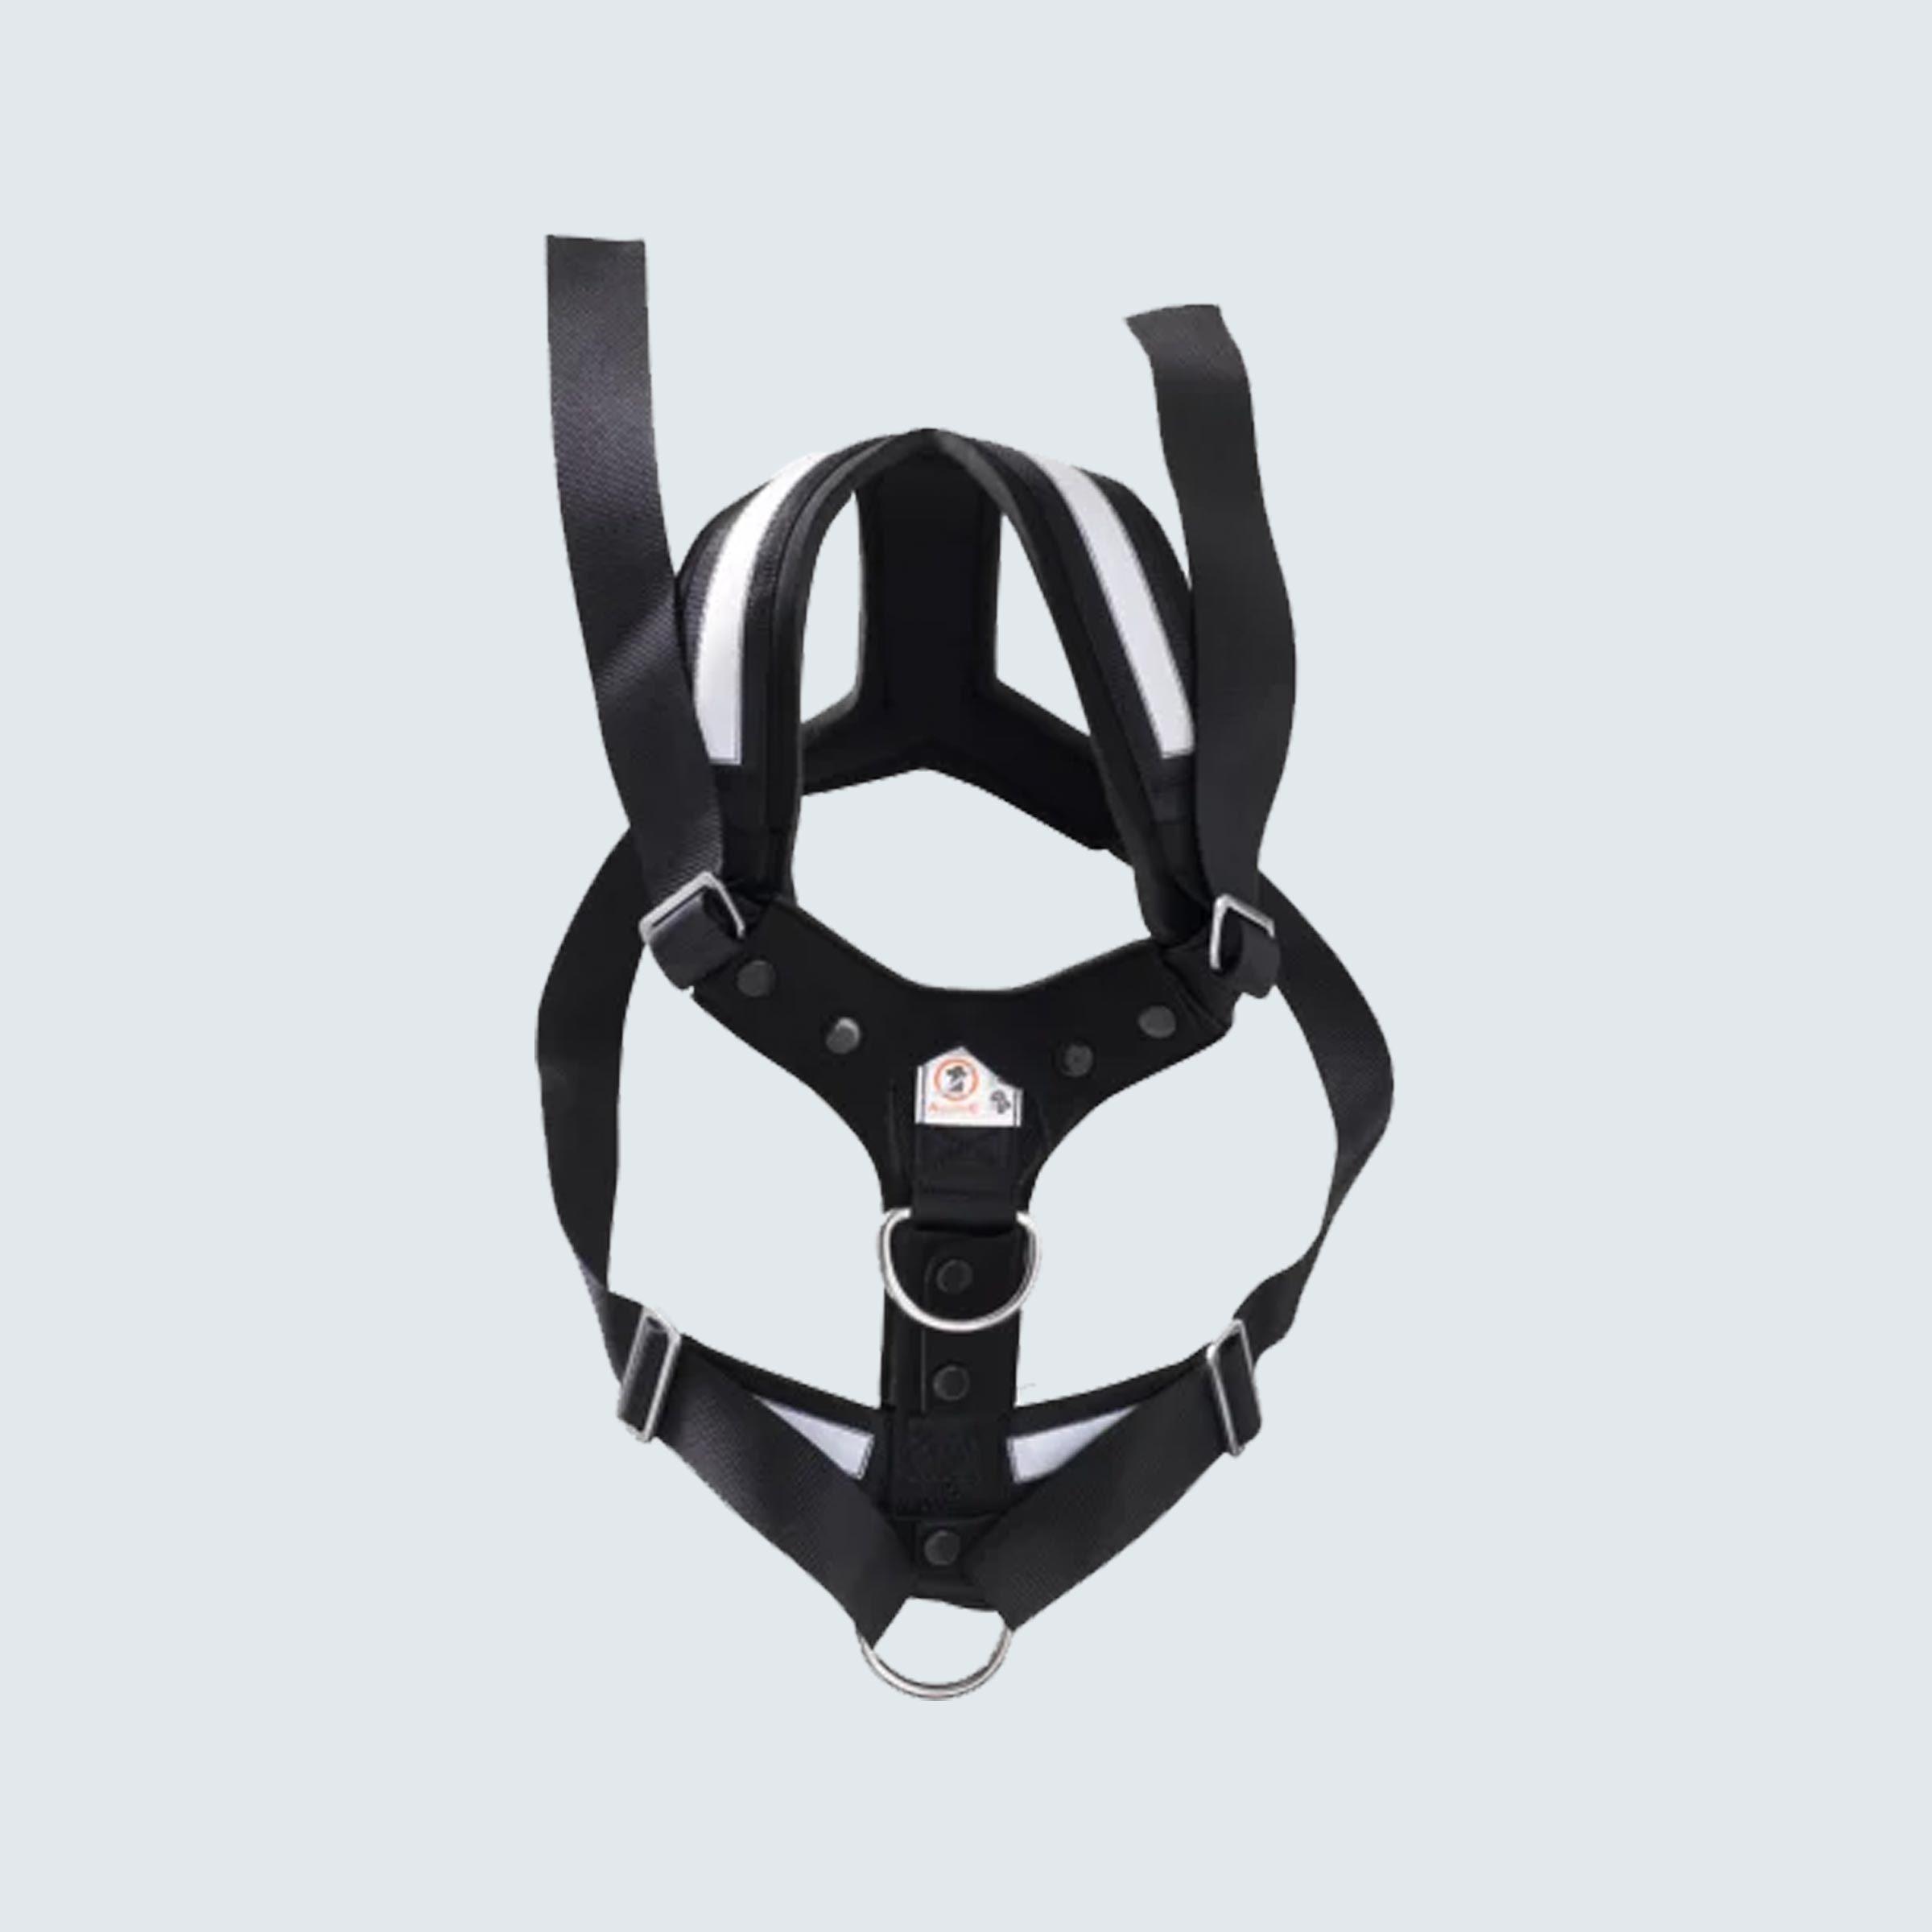 4X4 North America AllSafe Dog Harness